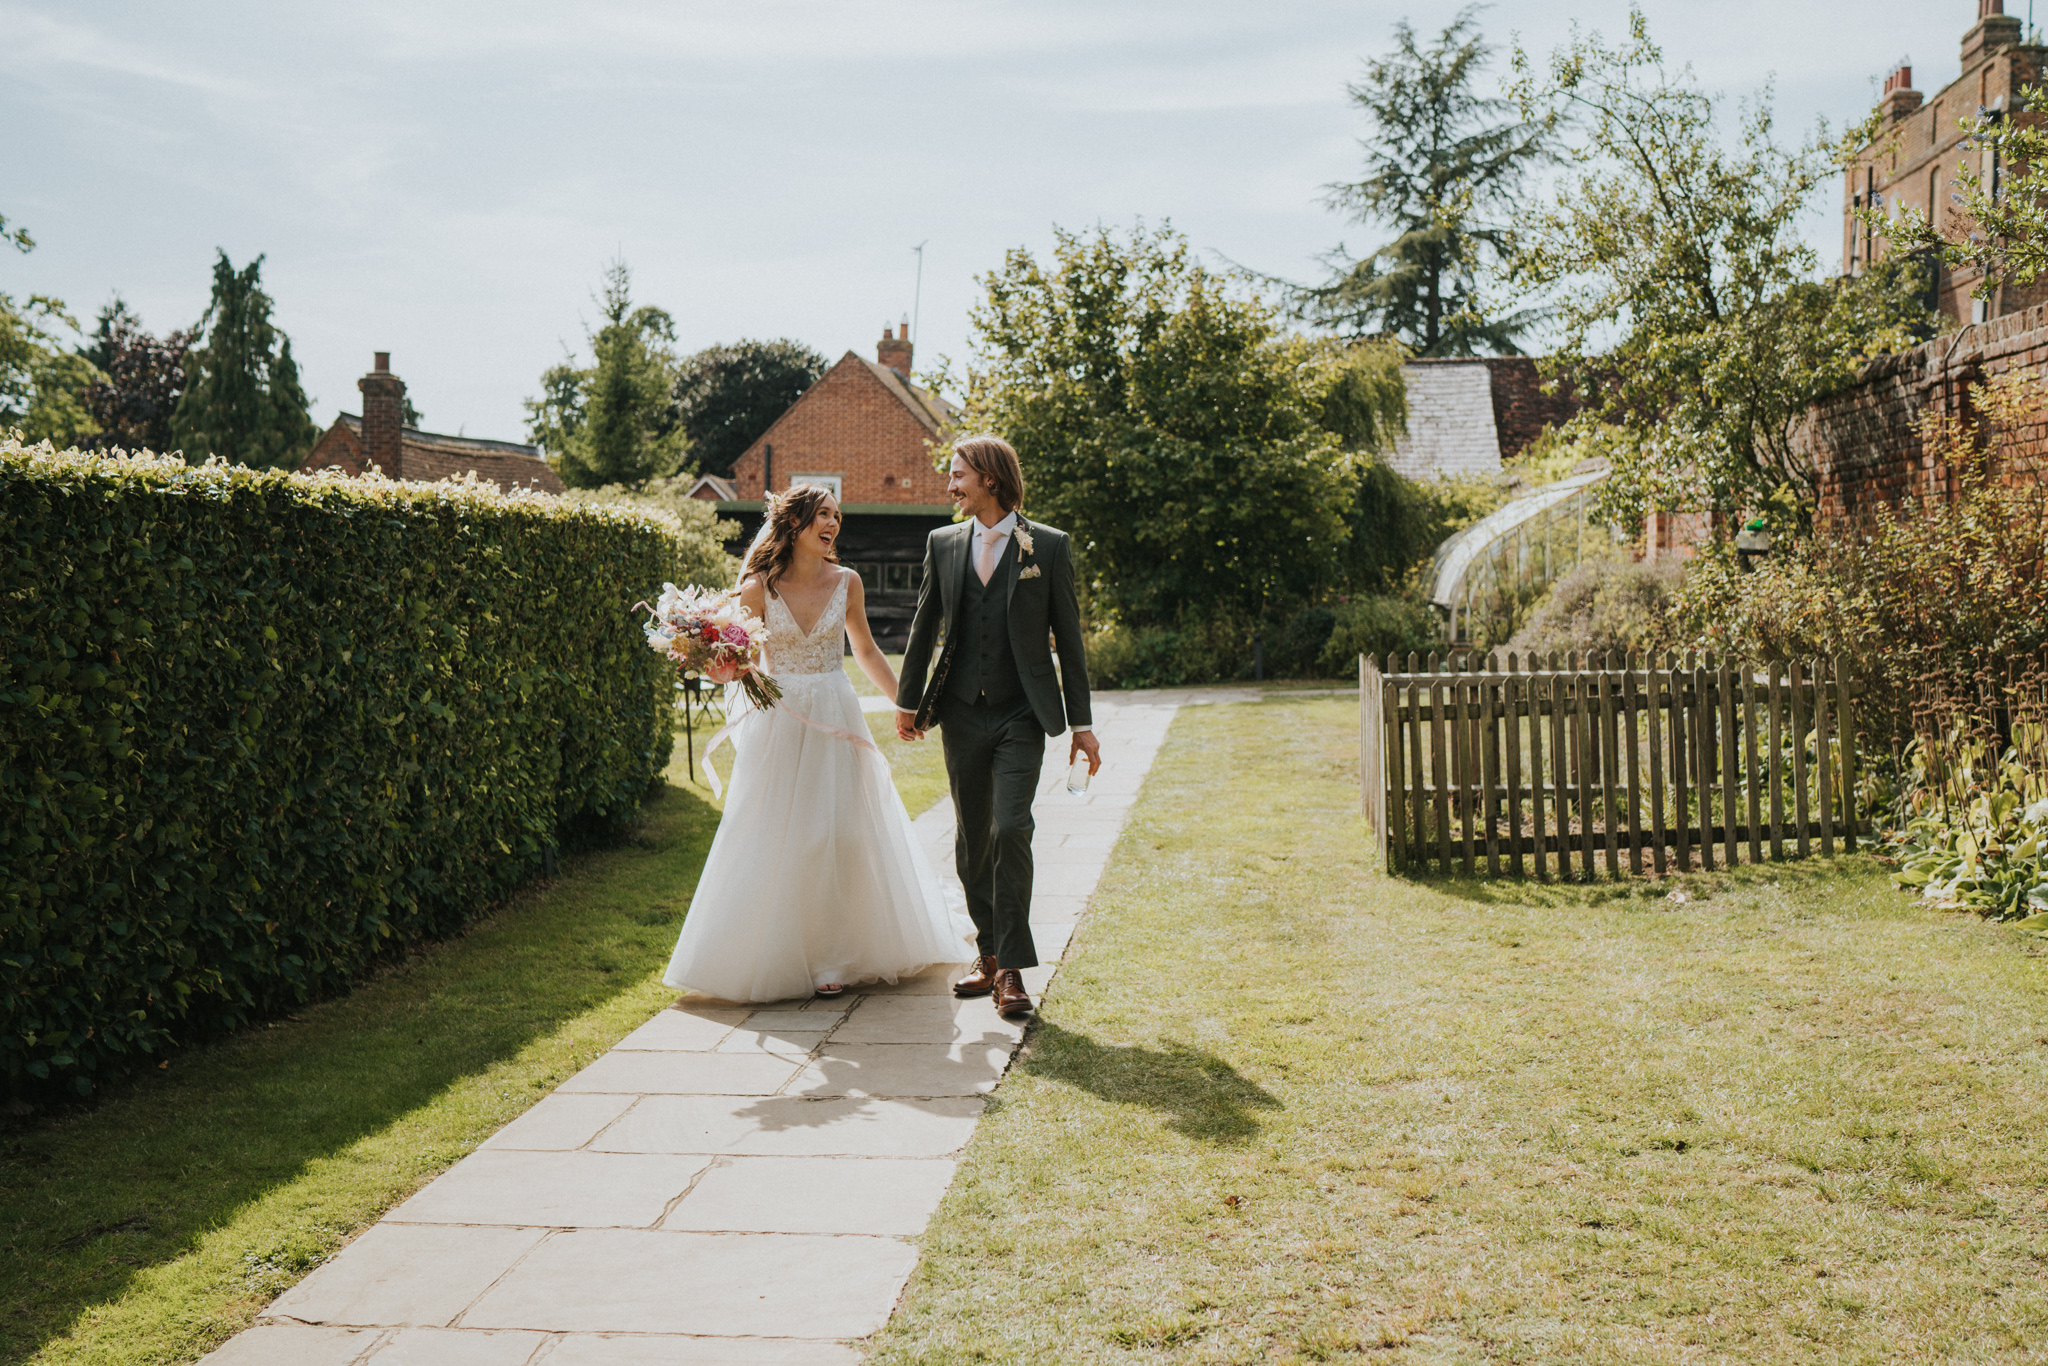 emi-Jack-boho-diy-wedding-eggington-house-grace-elizabeth-colchester-essex-alternative-wedding-photographer-suffolk-norfolk-devon (33 of 56).jpg